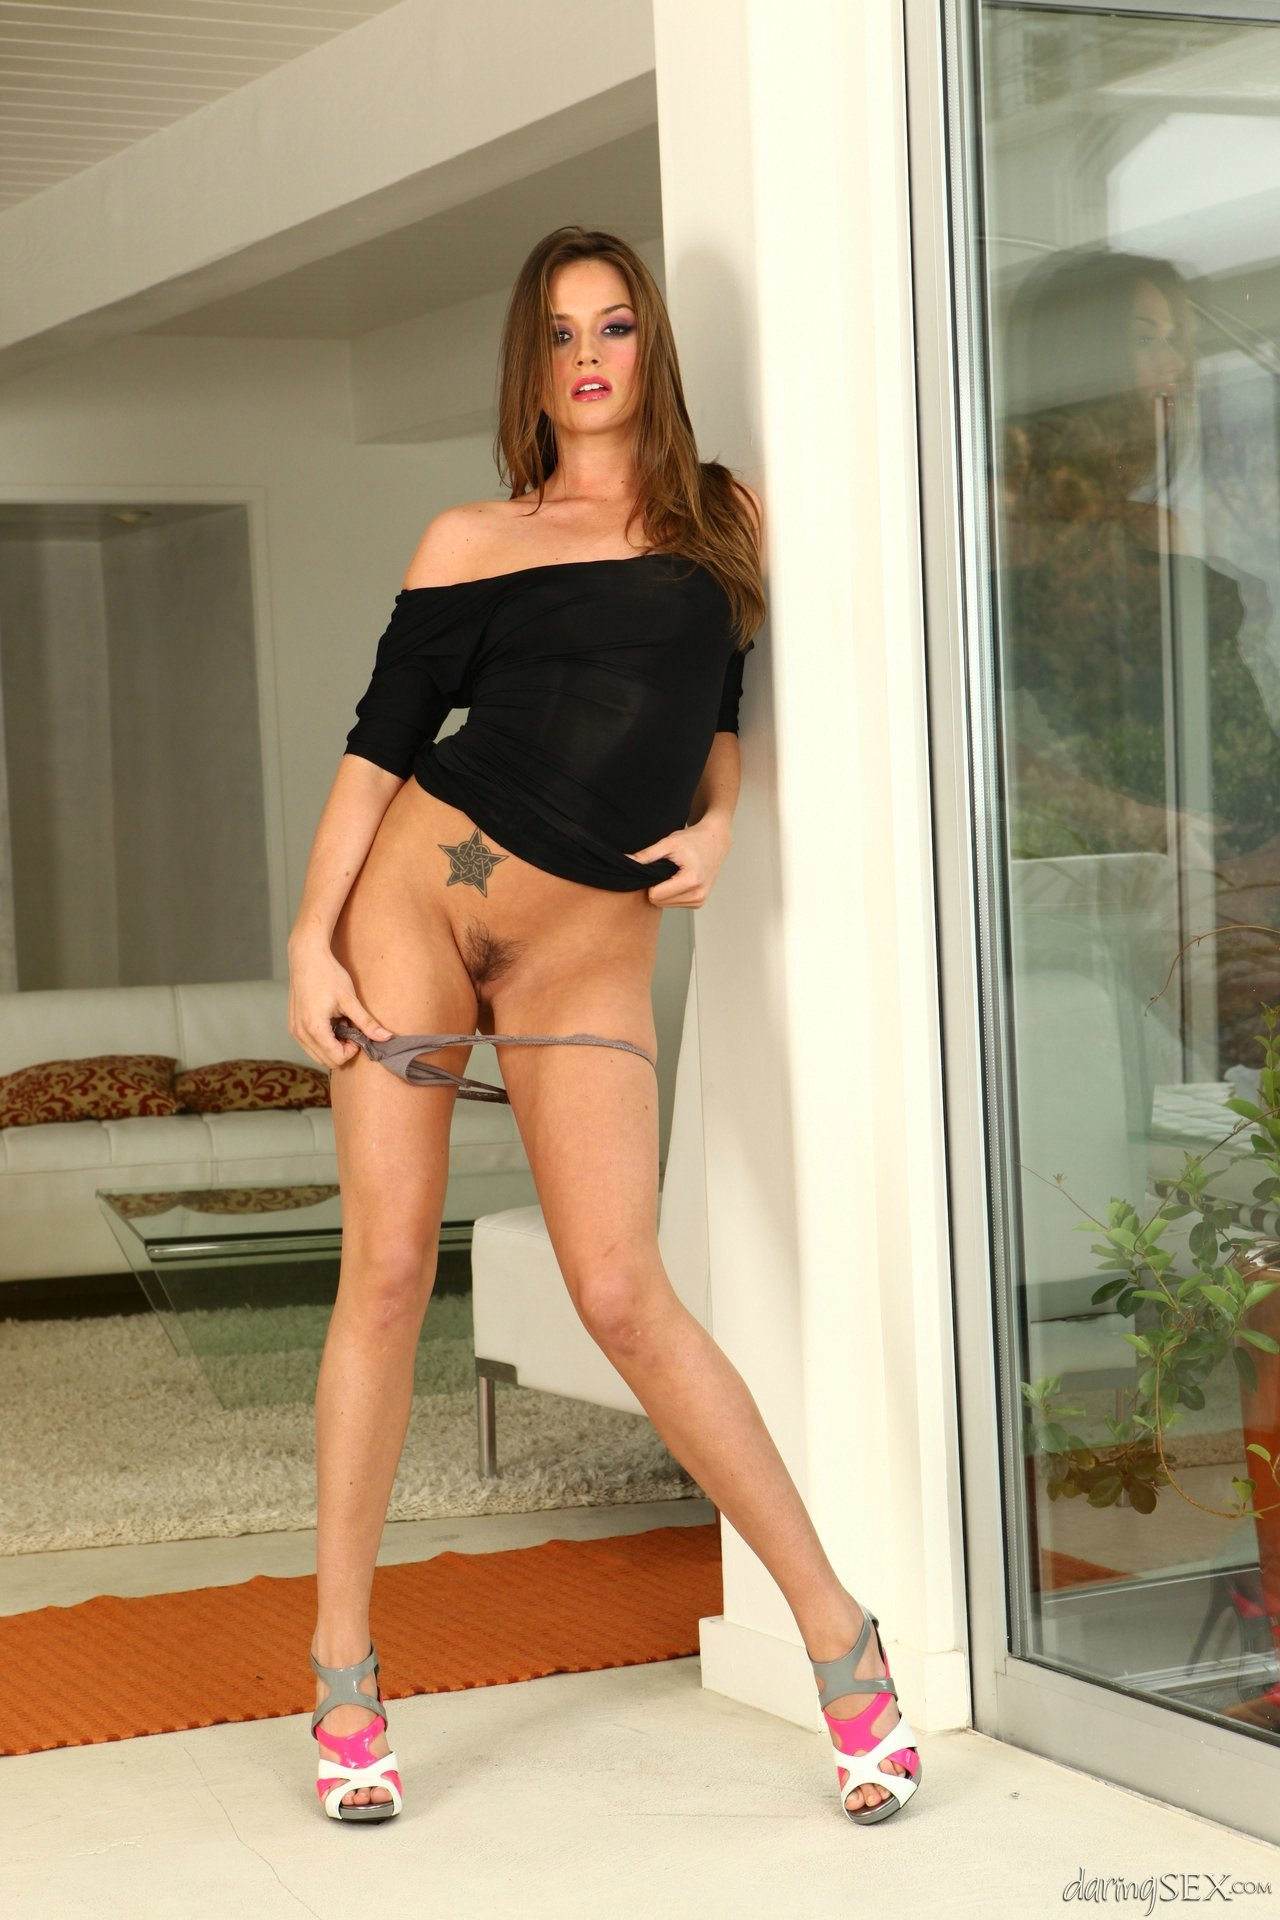 Tori Black Strips Off Her Sexy Short Black Dress - My -3421